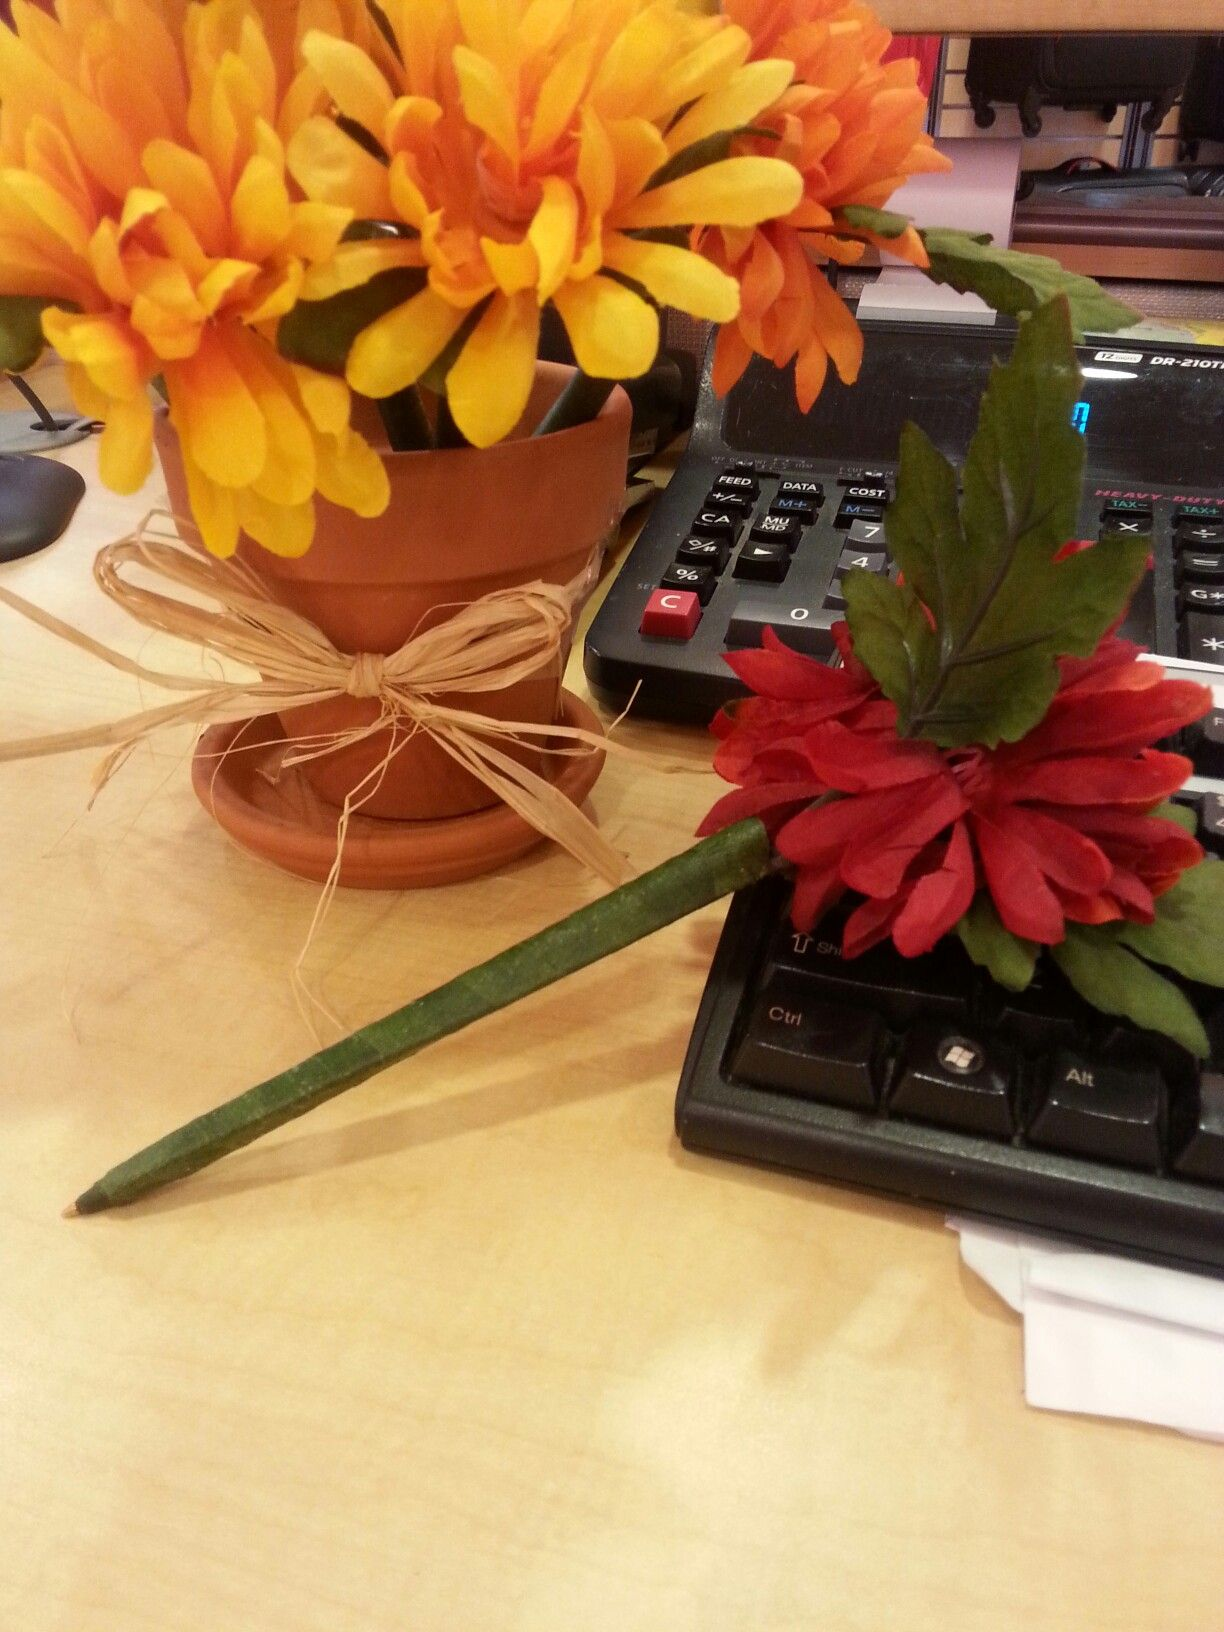 Flower Pen bouquet | Created by Kima | Pinterest